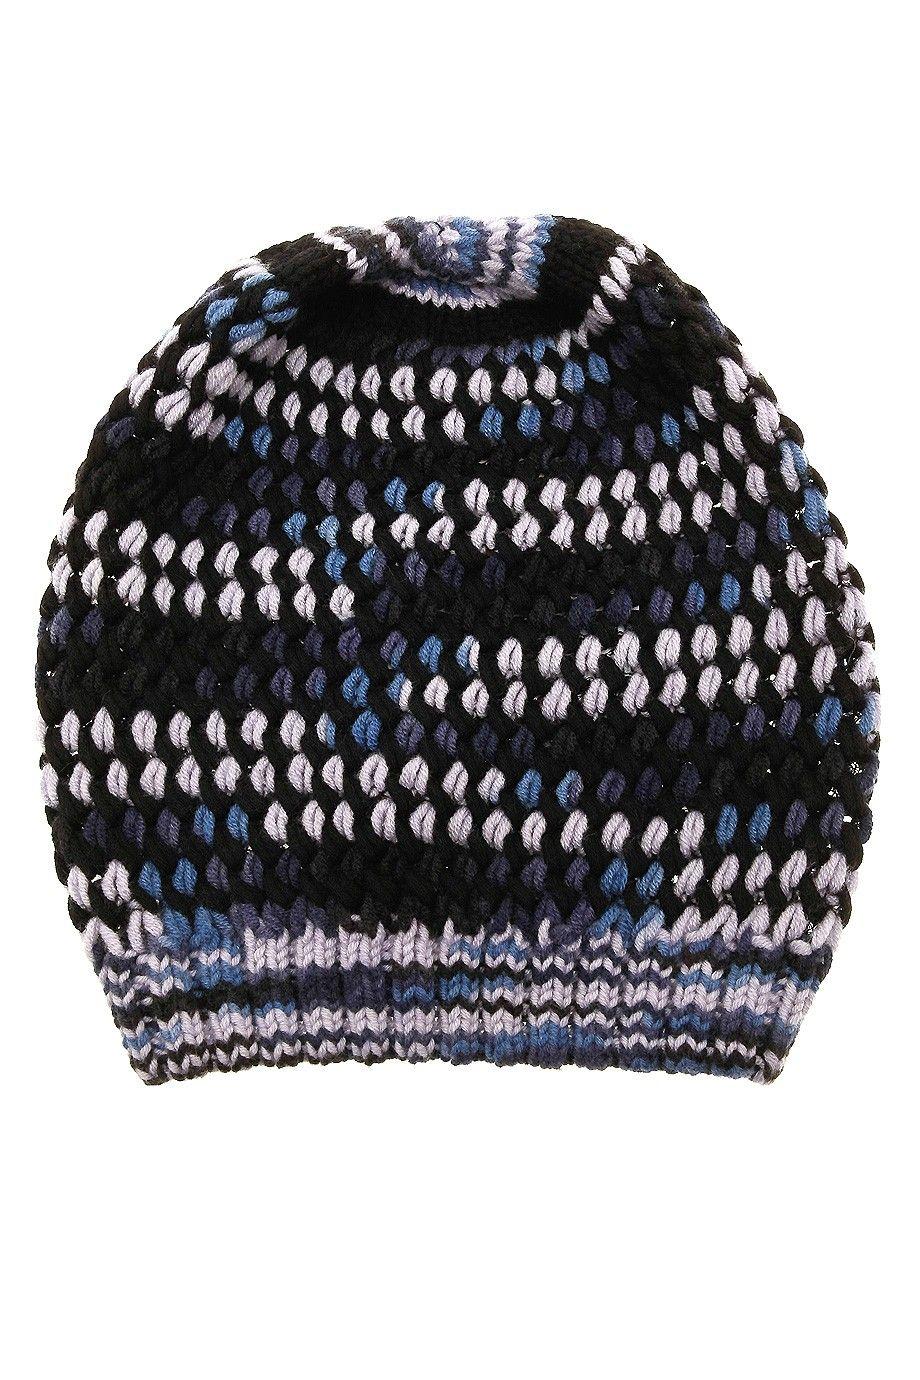 missoni hat - Google Search | fashion accessories | Pinterest